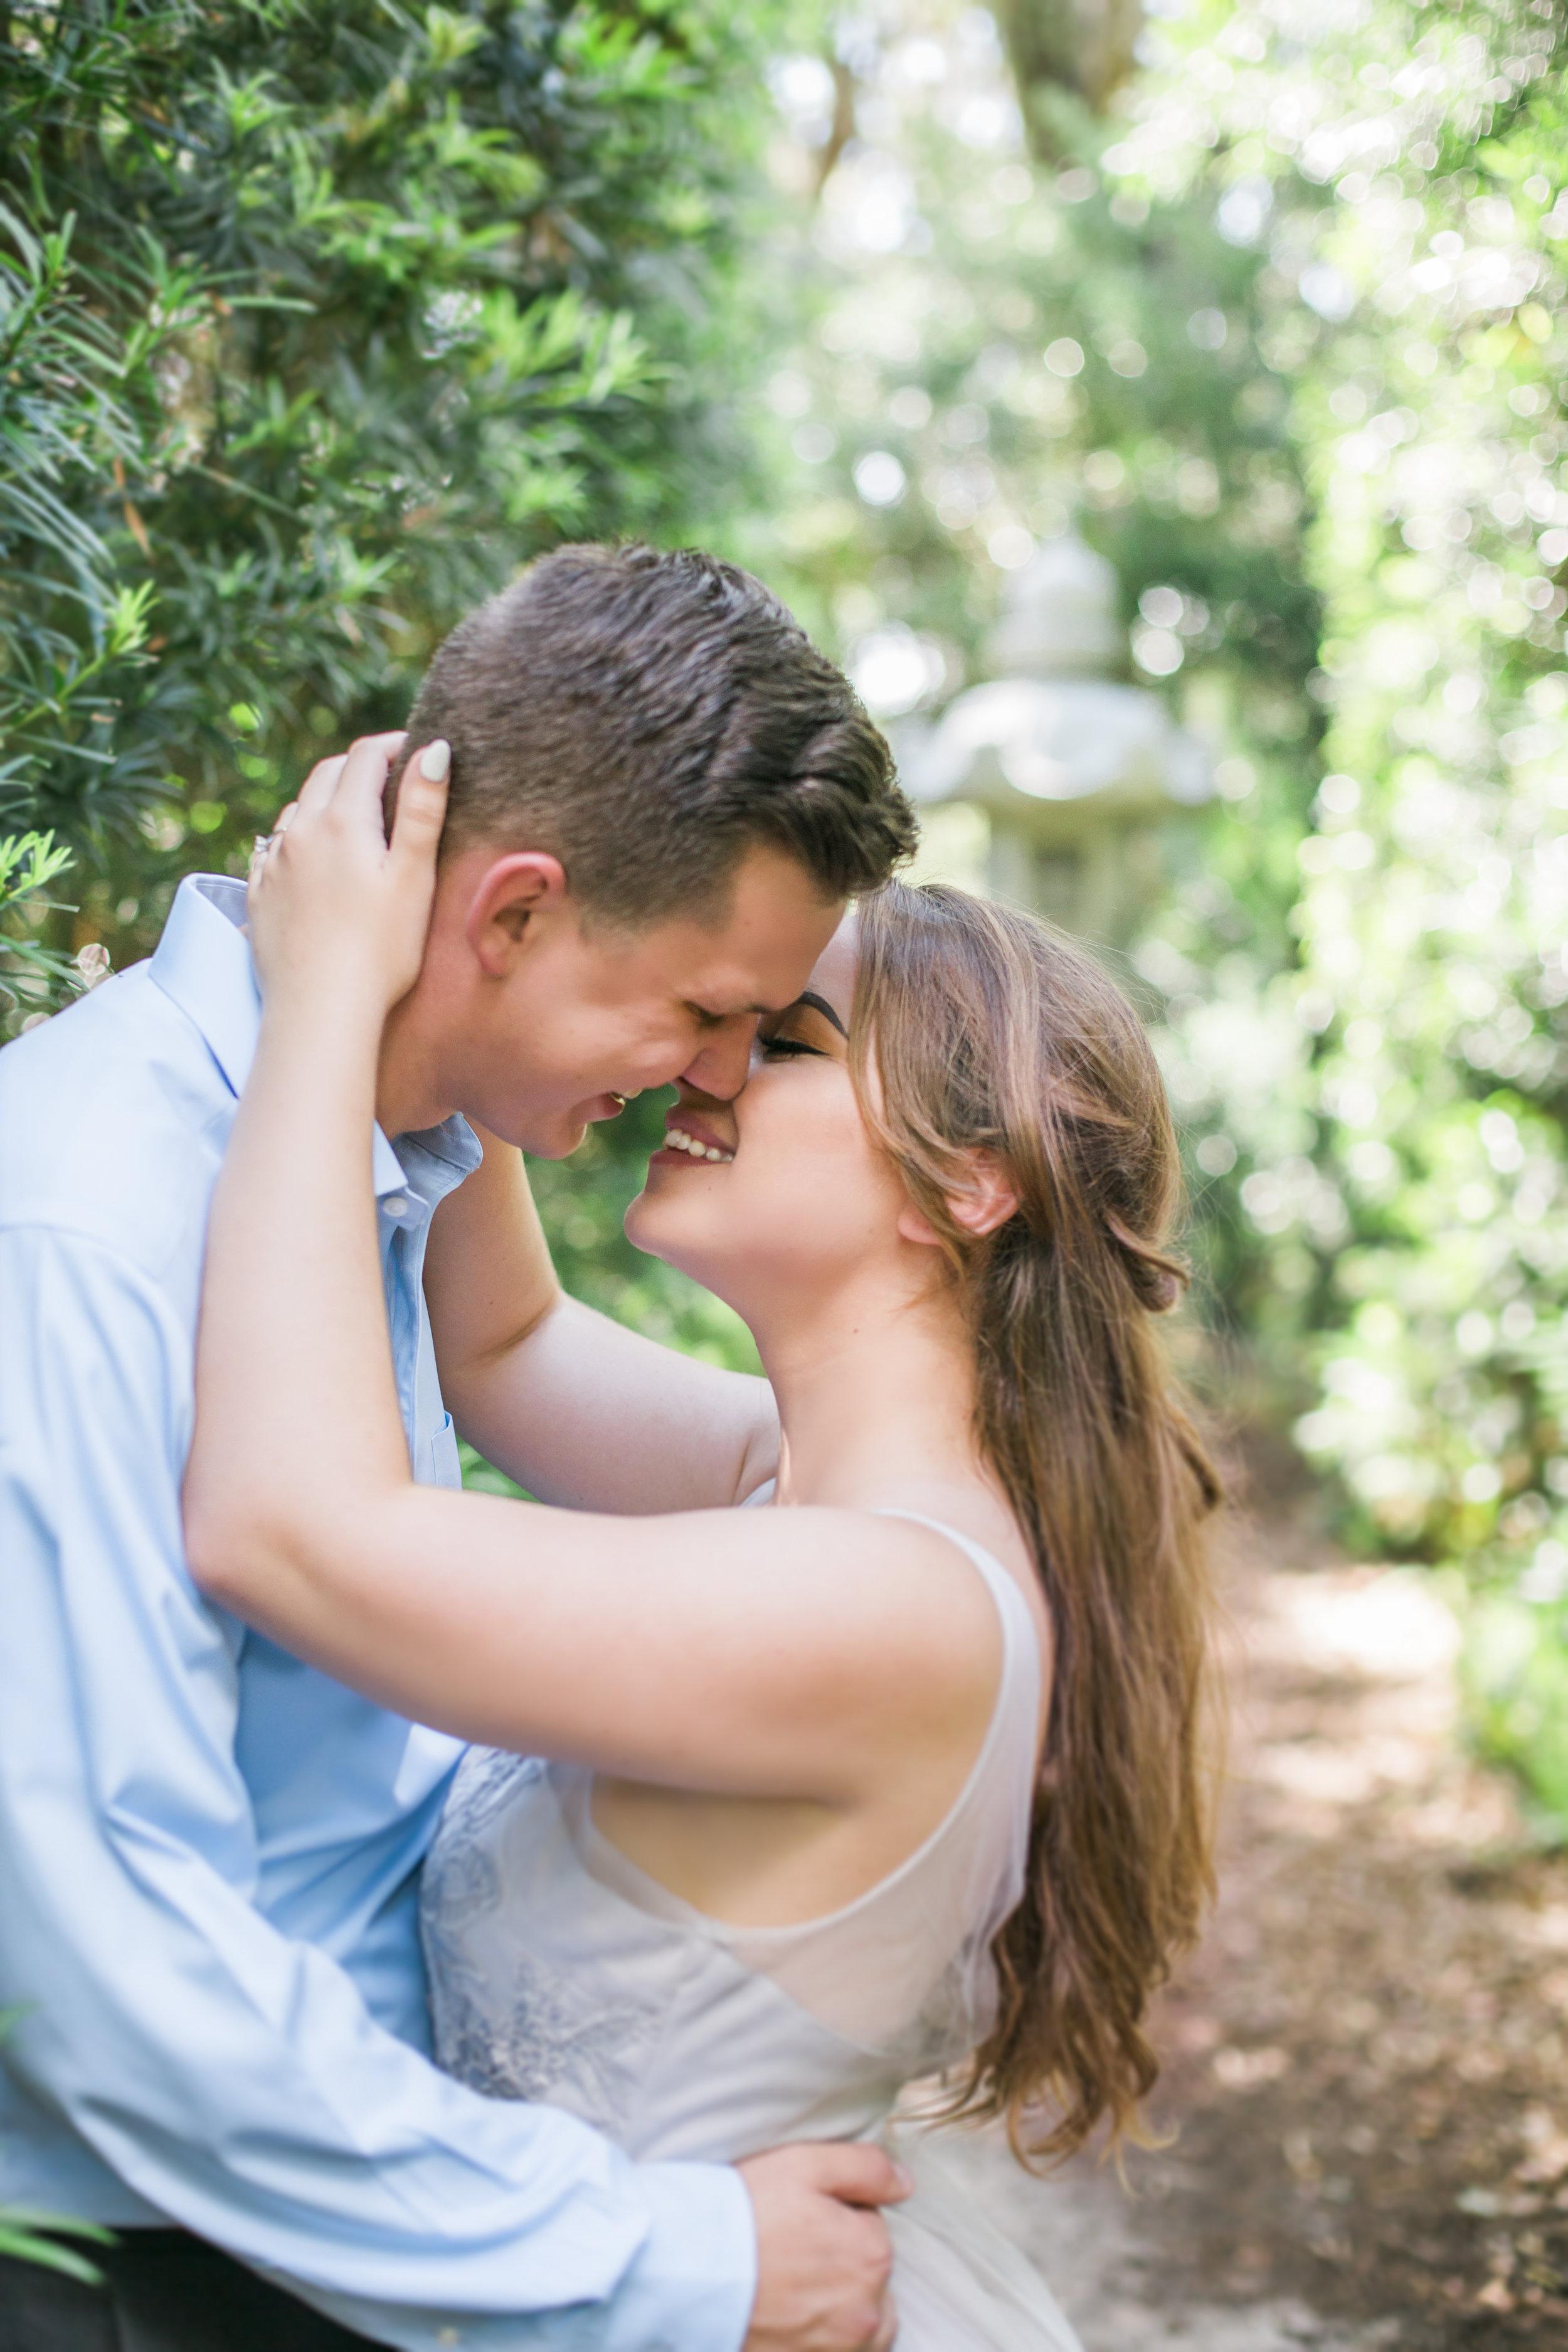 Scarlett + Derek - Bok Tower Gardens Wedding Photographer - Bok Tower Gardens Engagement Session - Preview Photos - Emily & Co. Photography (22).jpg